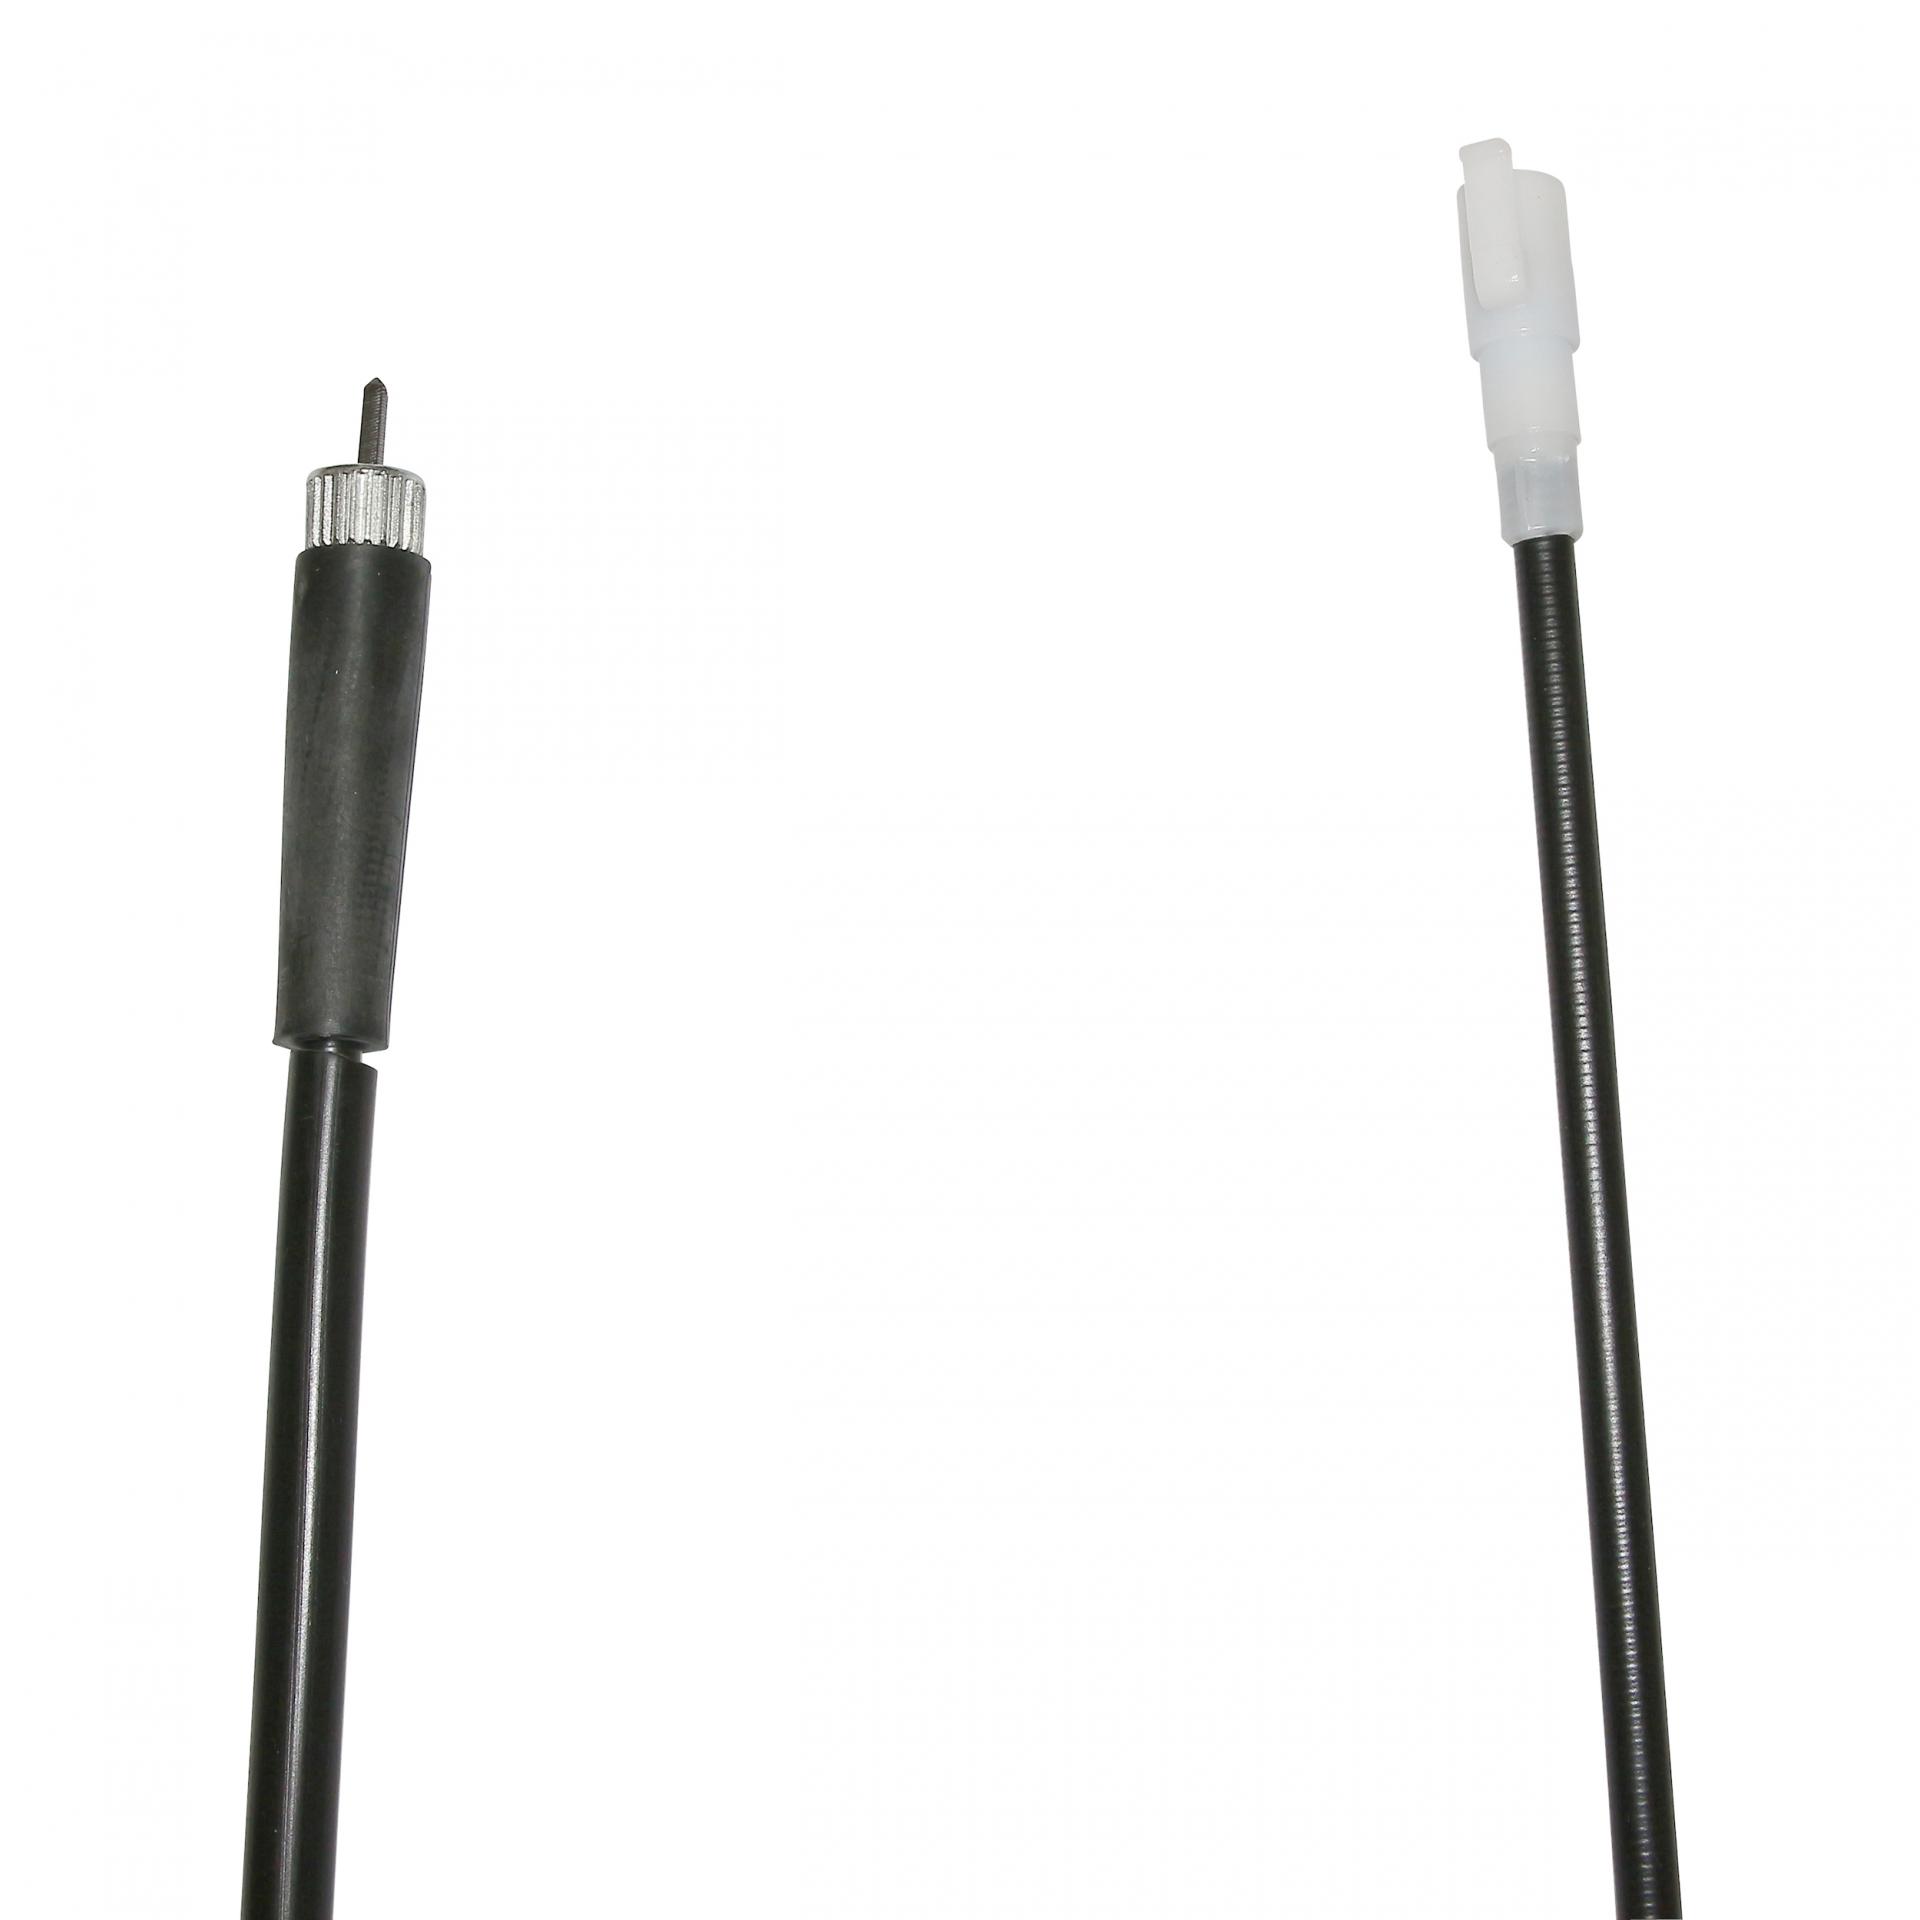 Câble compteur Piaggio 50 Free la poste 2000-01